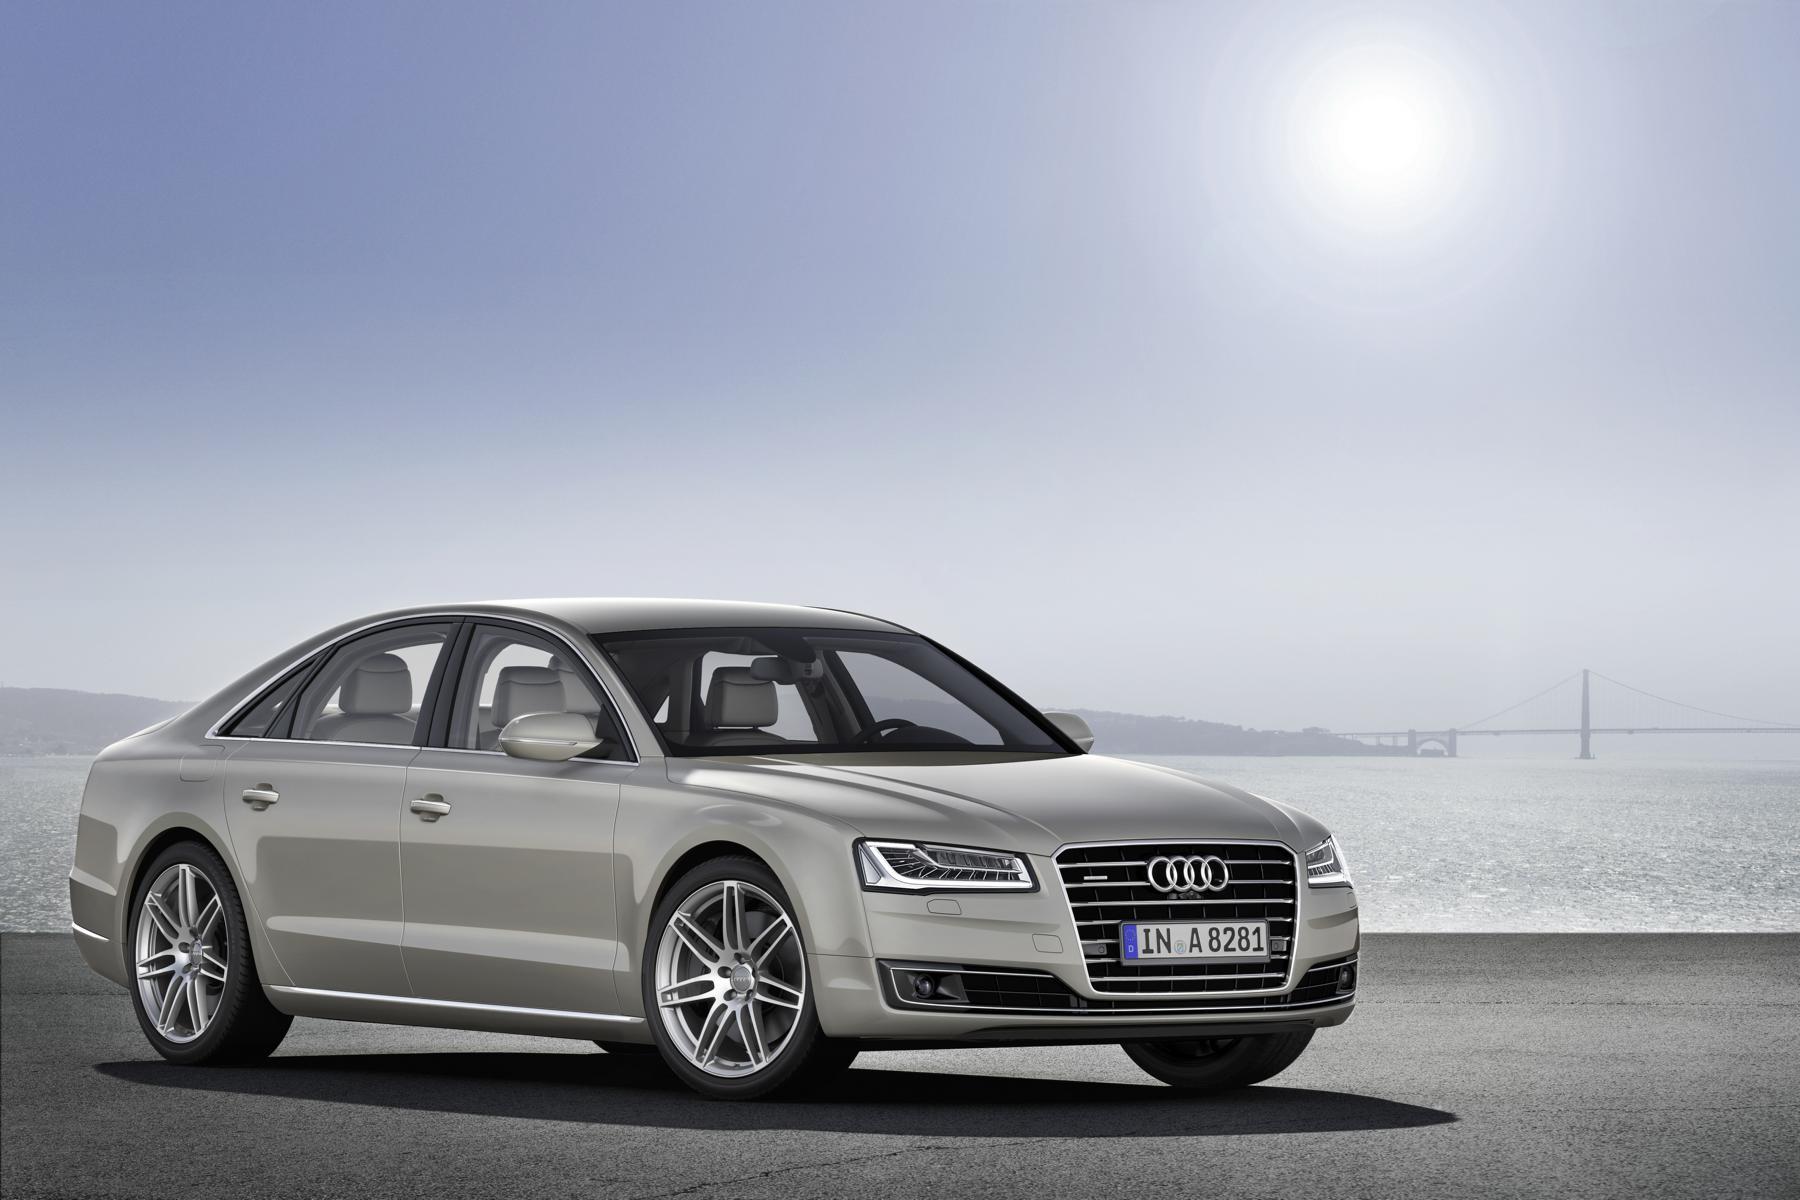 Audi_A8_TDI_02_34